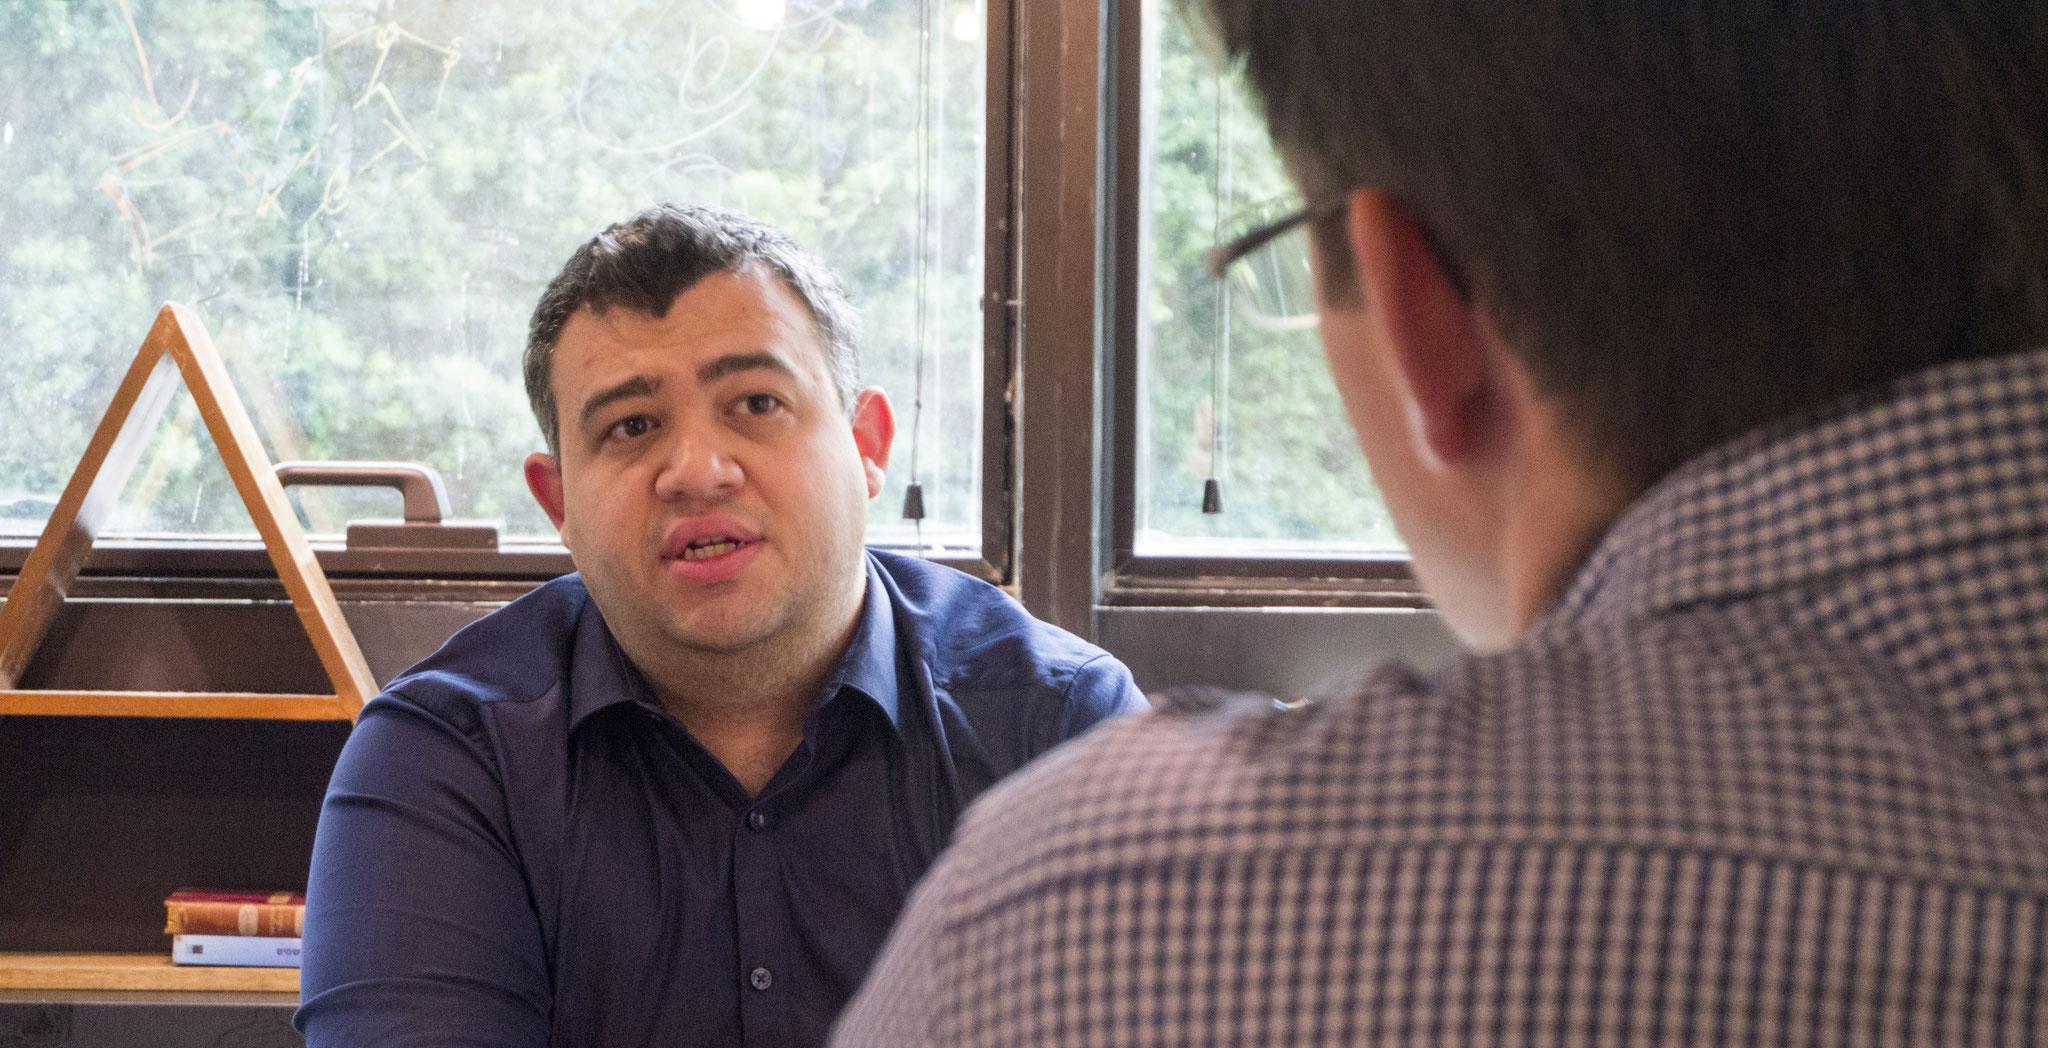 Cyber-Experte: Vor der Intezer-Grüdnung war Itai Tevet Leiter des Computer Emergency Response Teams der Israel Defense Forces